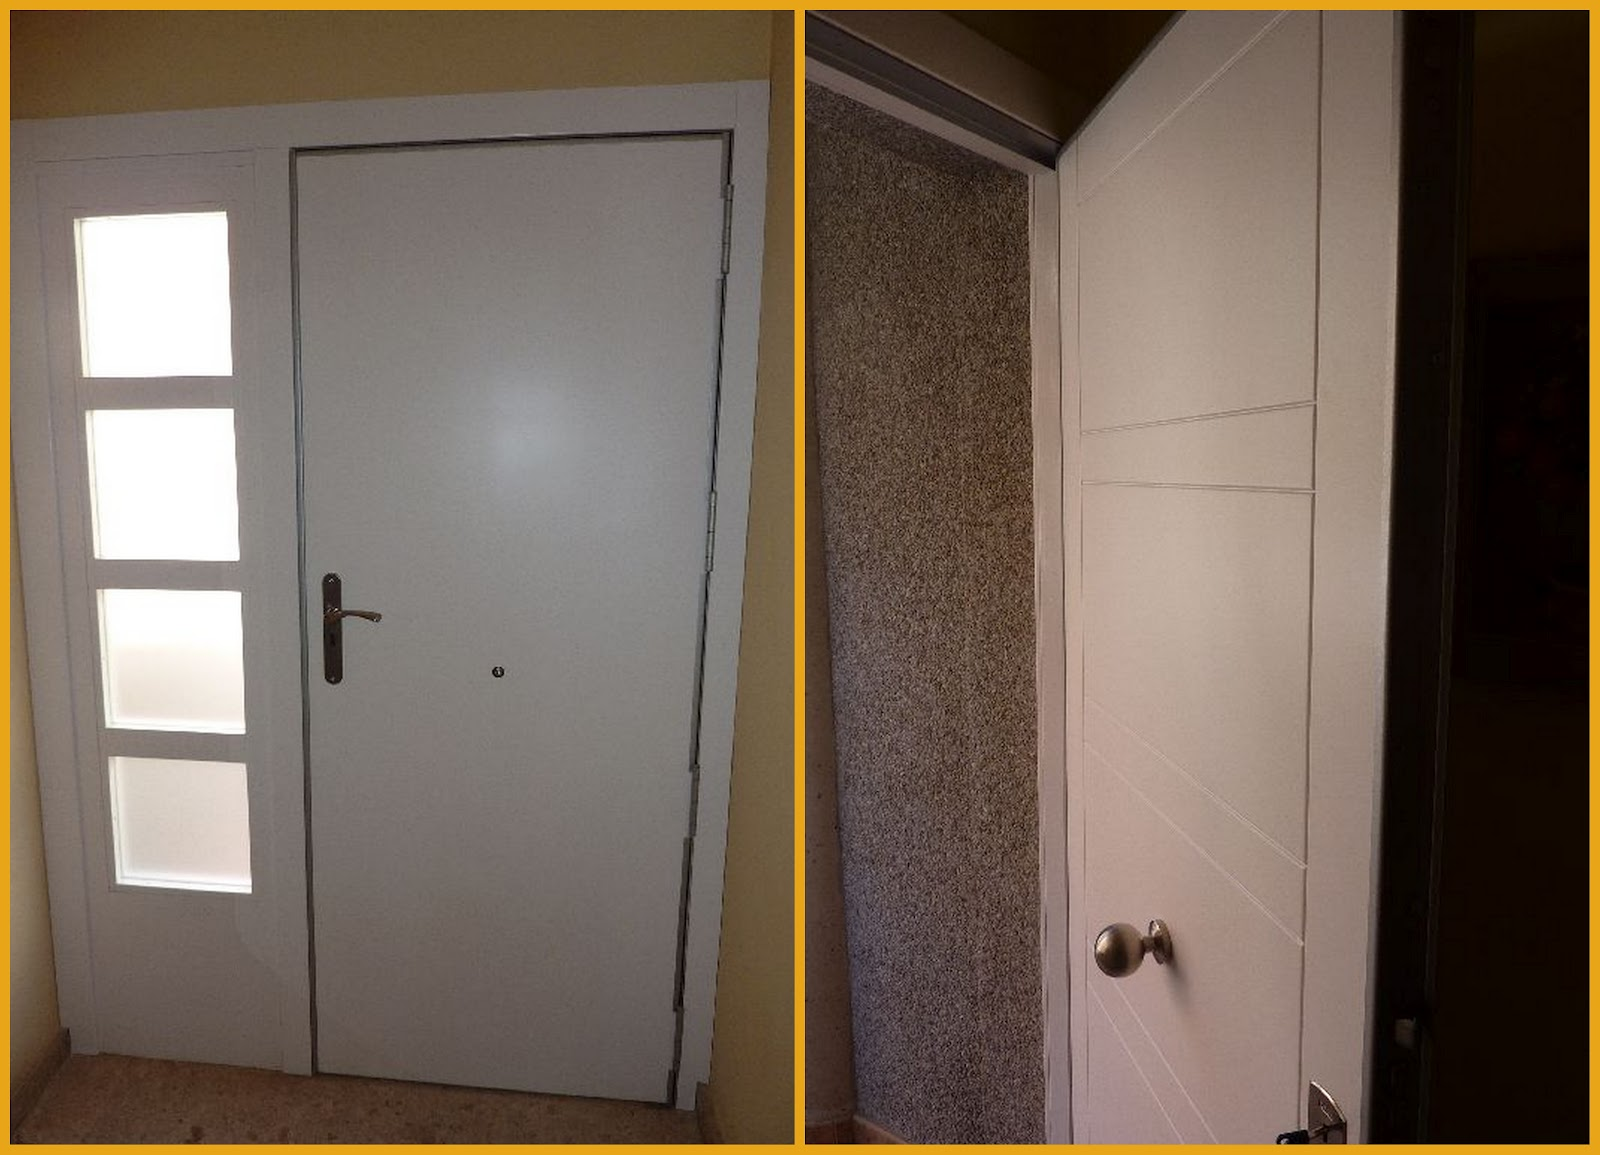 Carpinteria muebles a medida puerta de entrada for Puerta xor 3 entradas